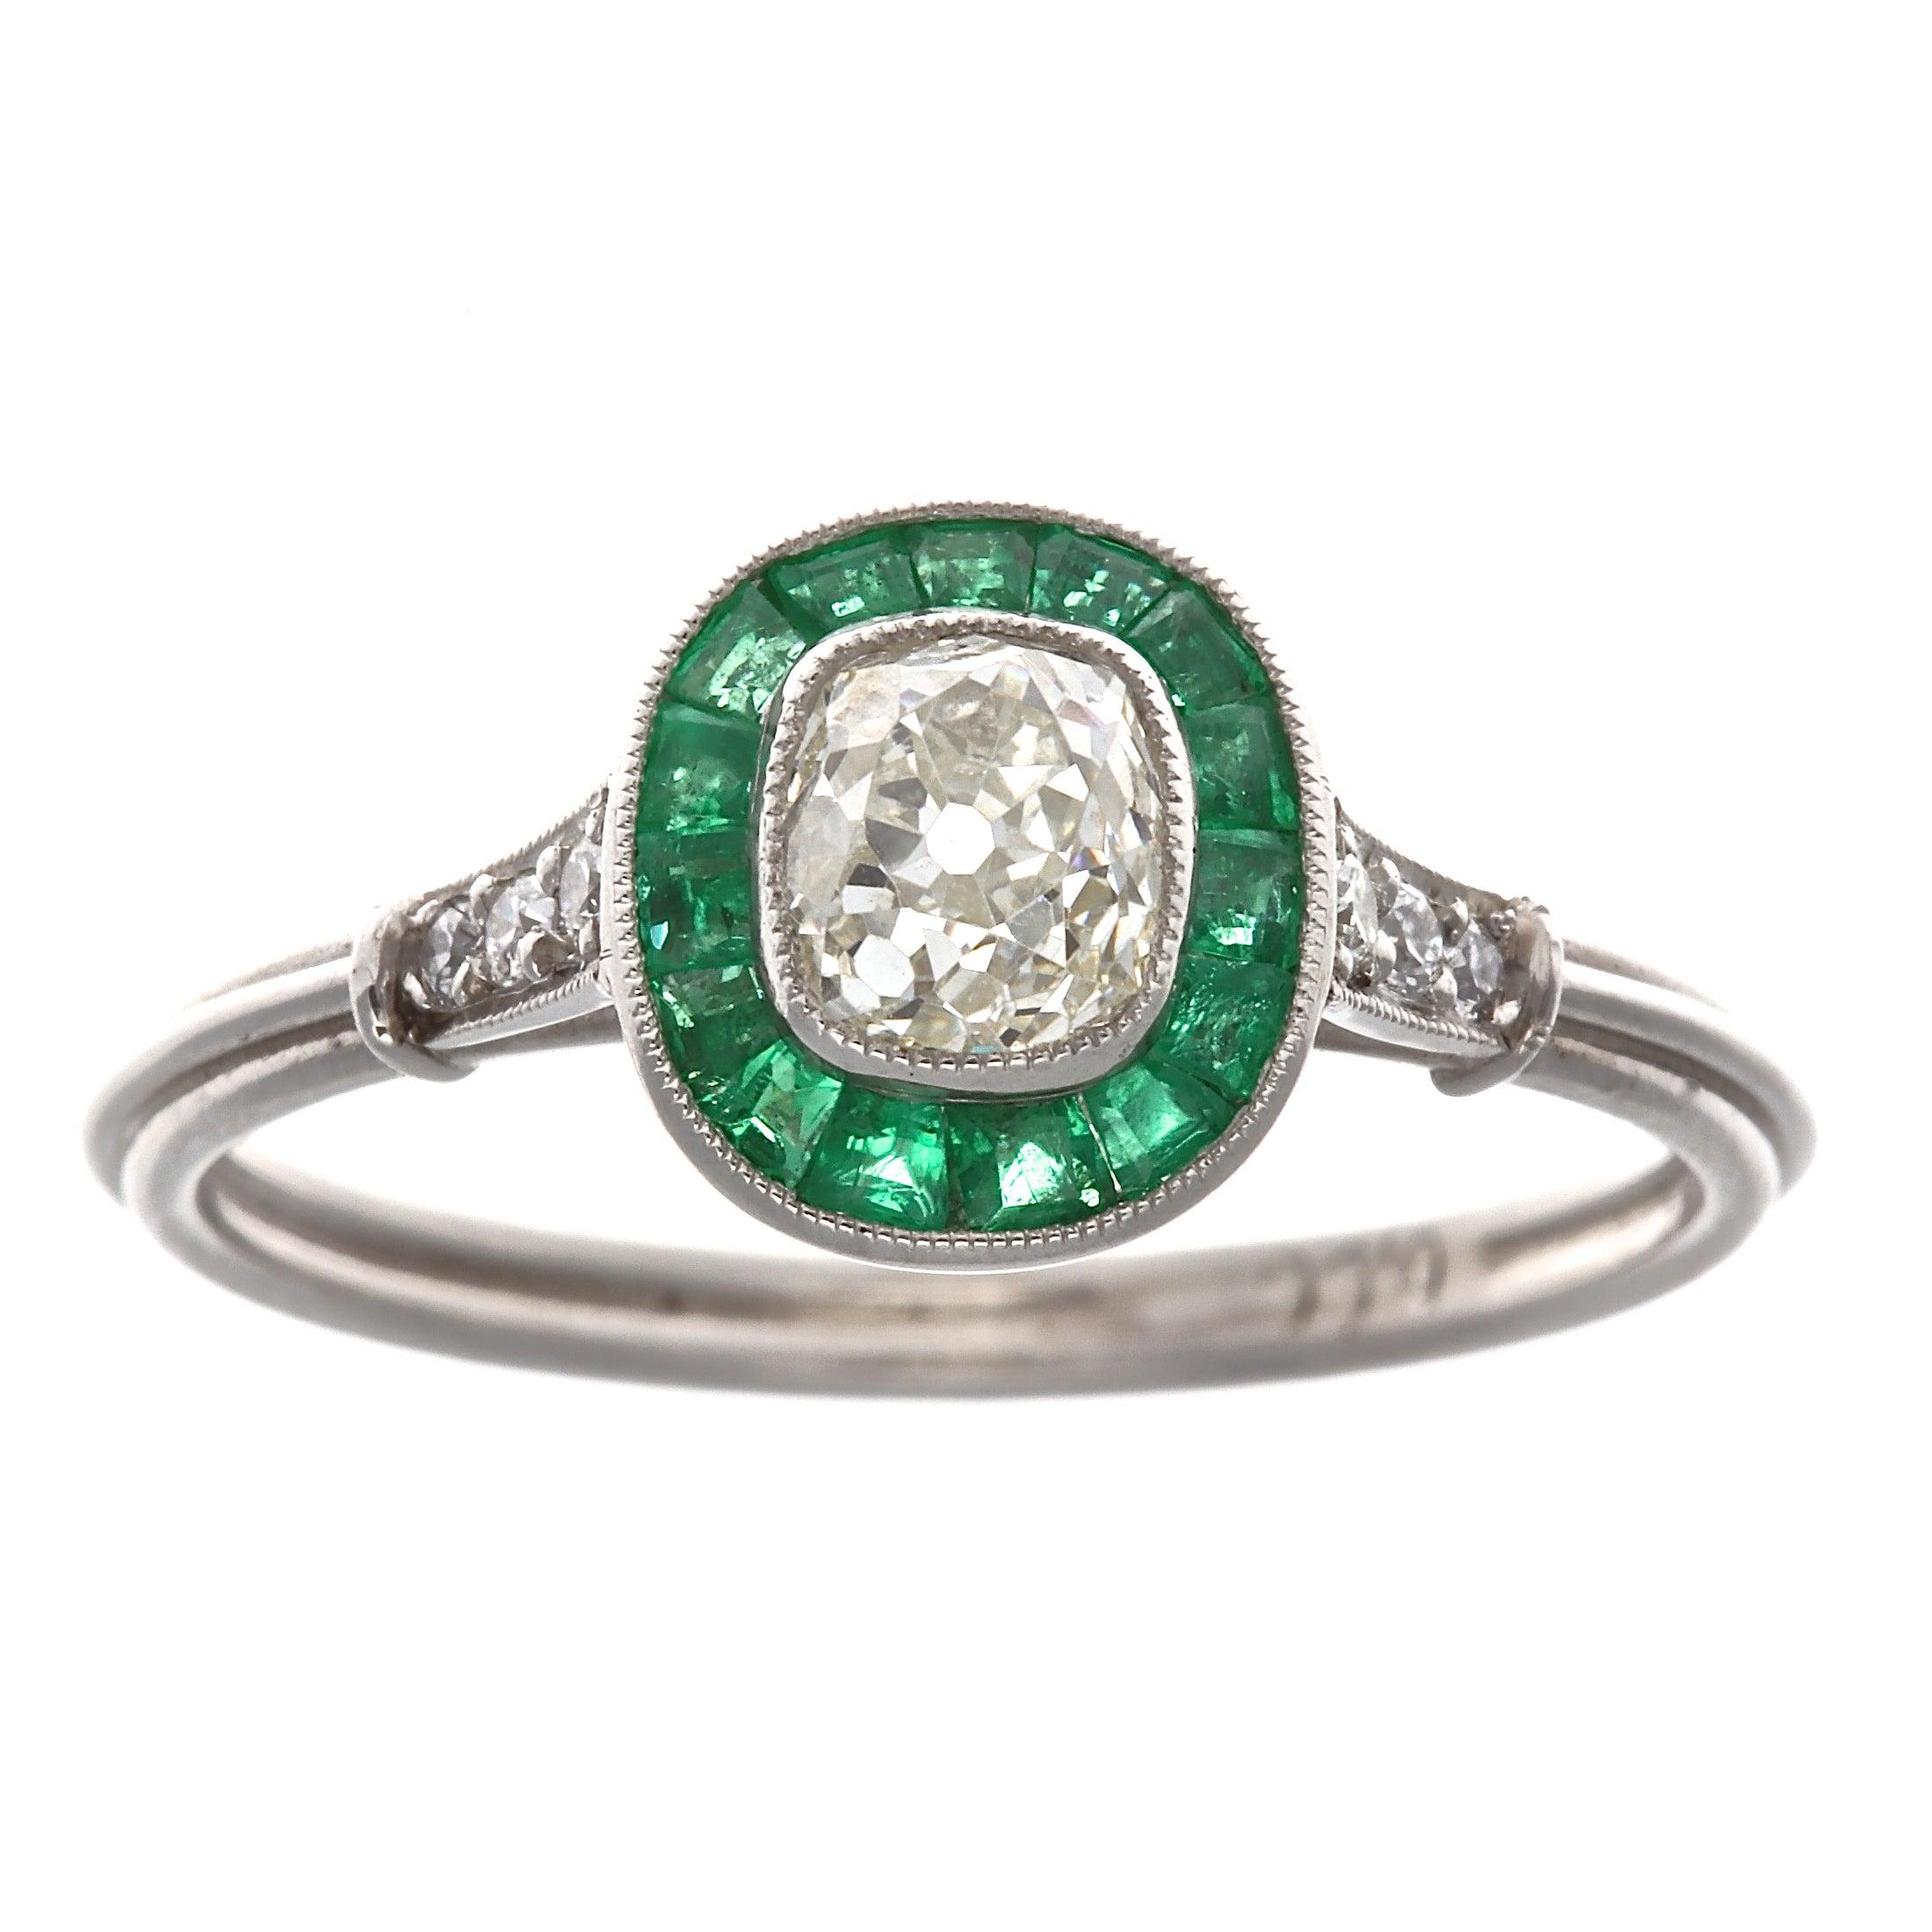 Art Deco Style Diamond Emerald Platinum Engagement Ring